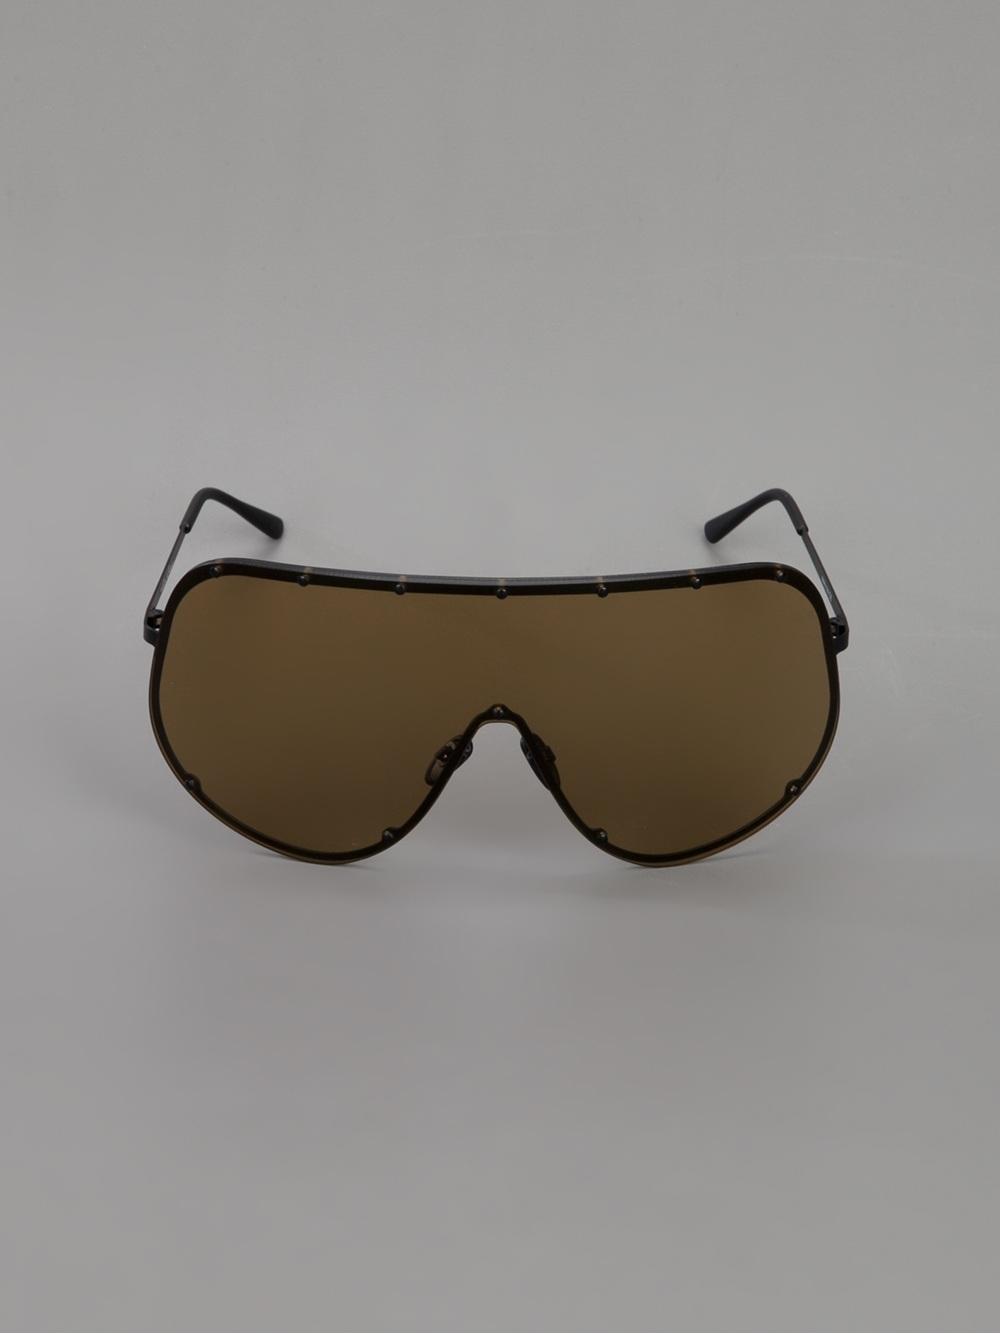 31ec0e21dd5 Rick Owens Oversized Tinted Sunglasses in Black for Men